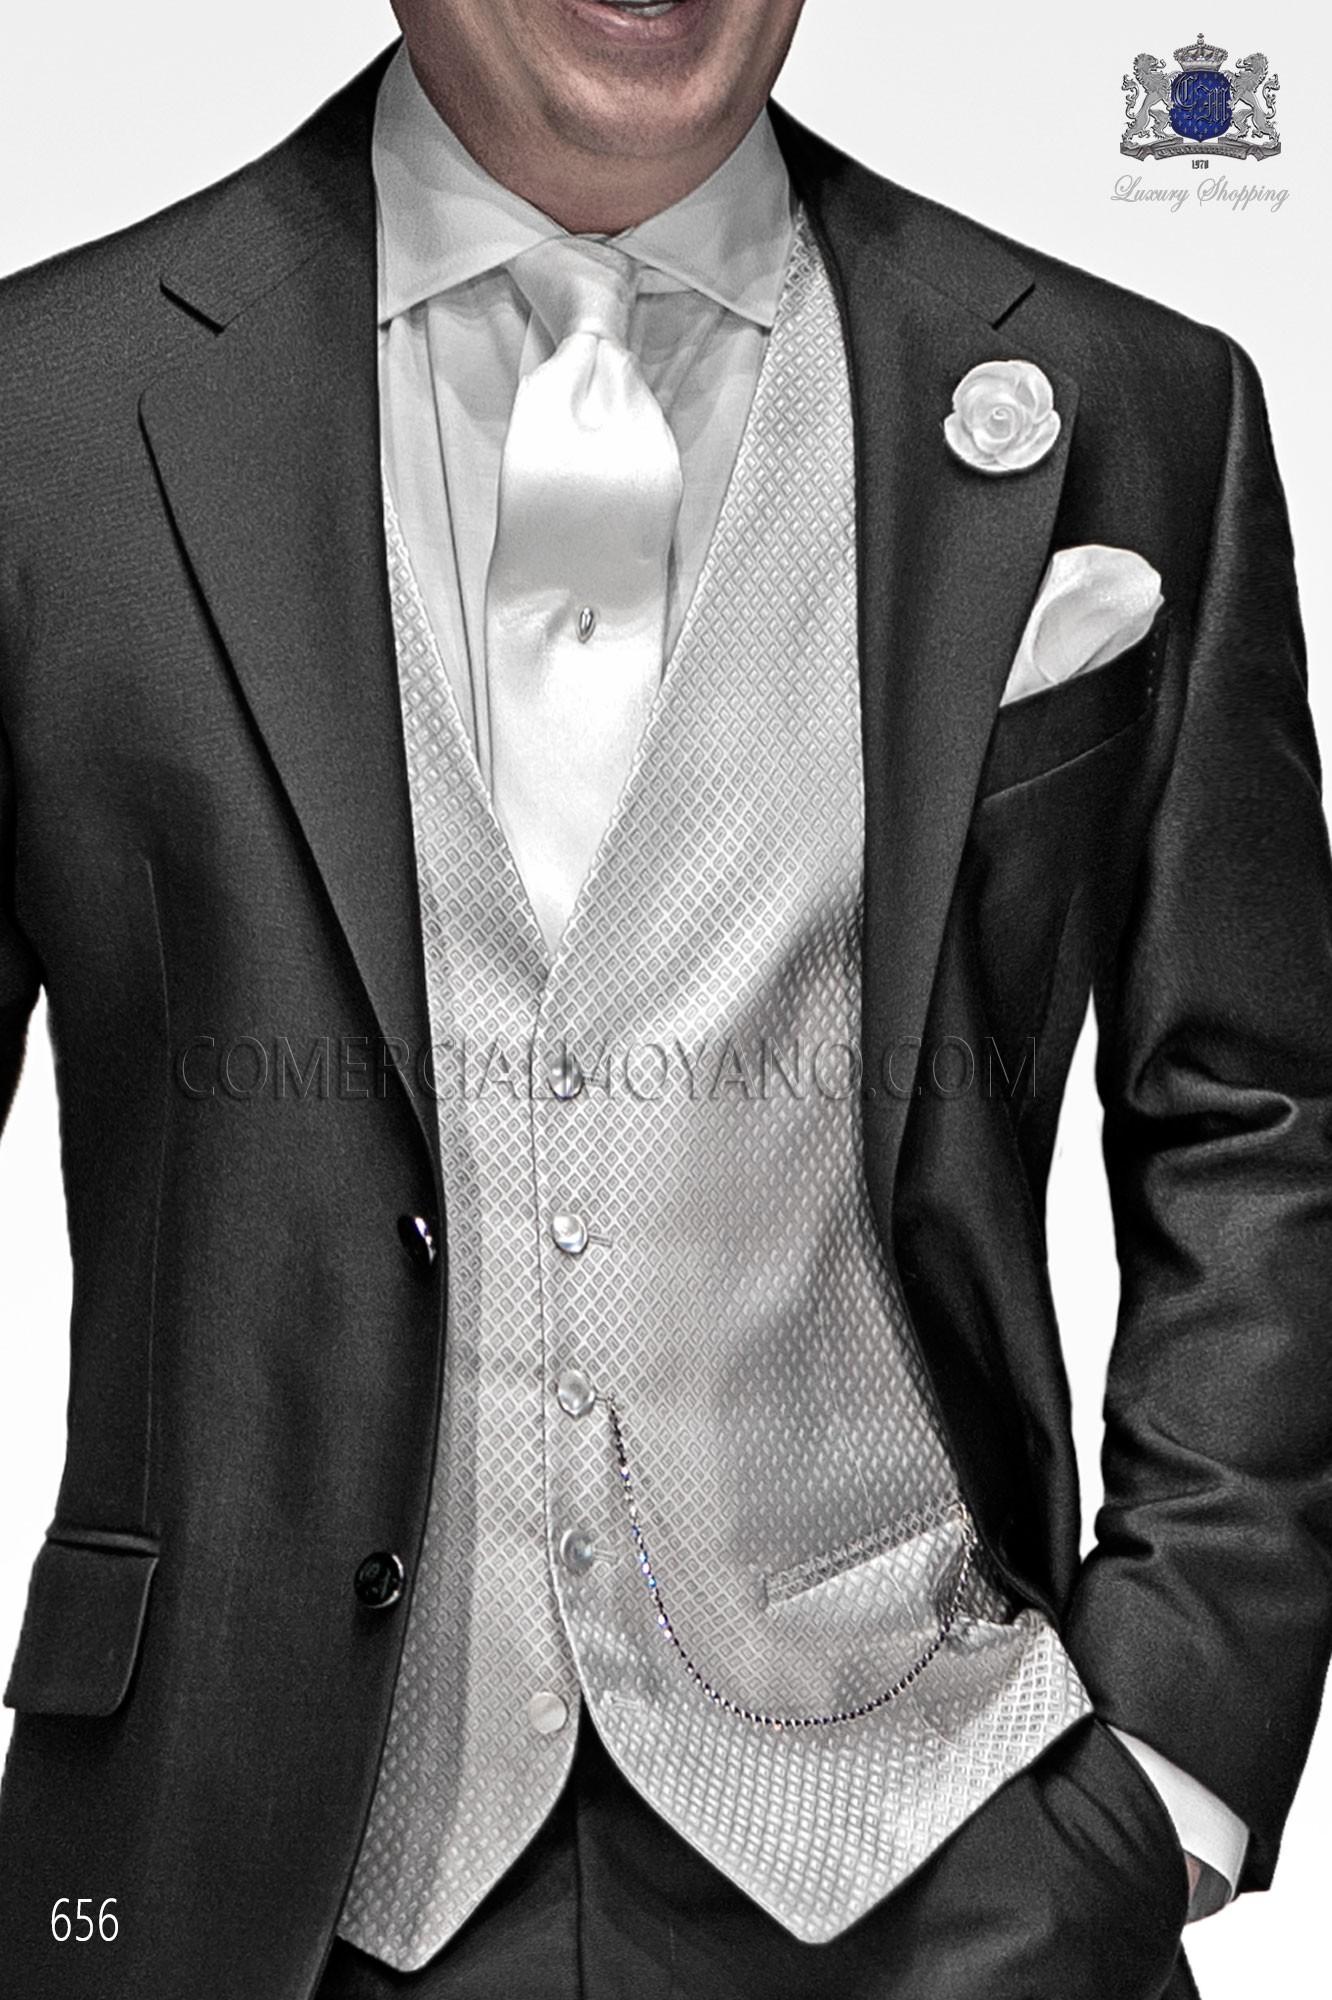 Italian gentleman gray antracite men wedding suit, model: 656 Ottavio Nuccio Gala 2017 Gentleman Collection